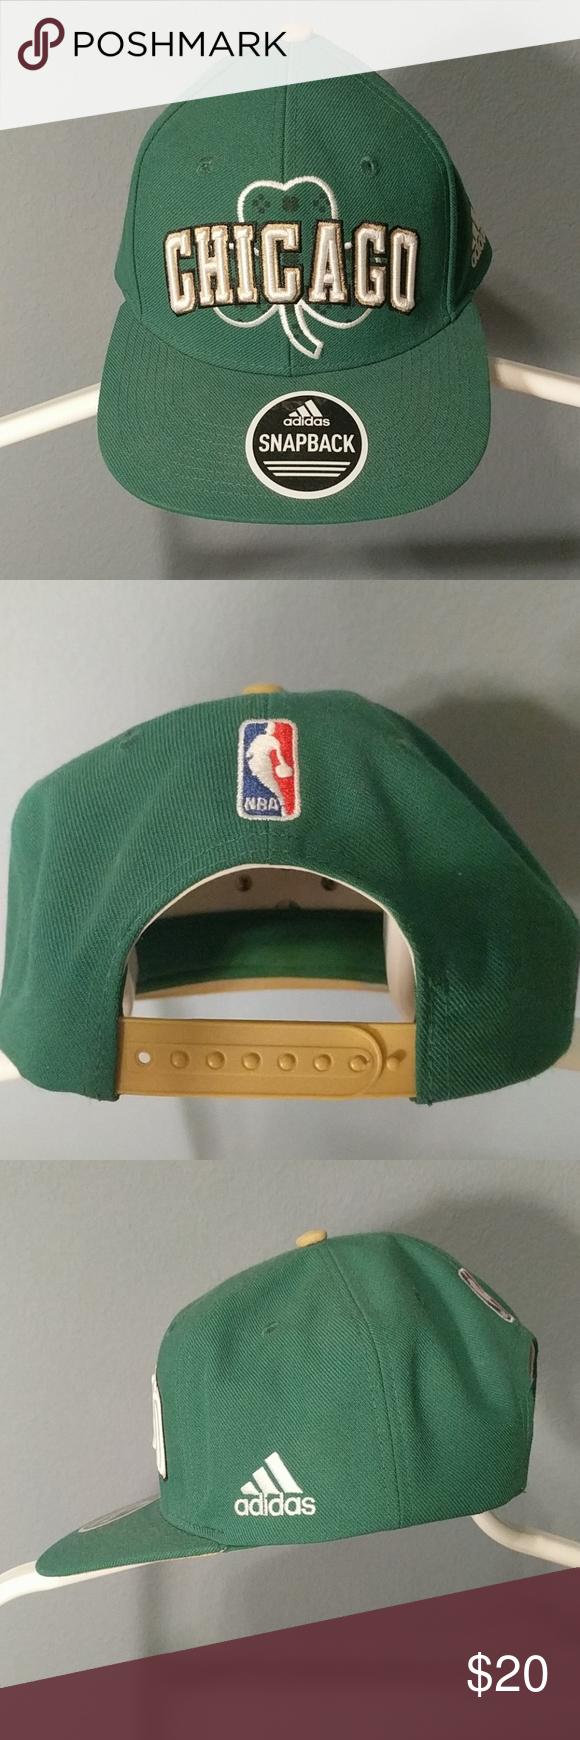 78243186ee8 Adidas Chicago Bulls Snapback St. Patrick s day snapback. adidas  Accessories Hats